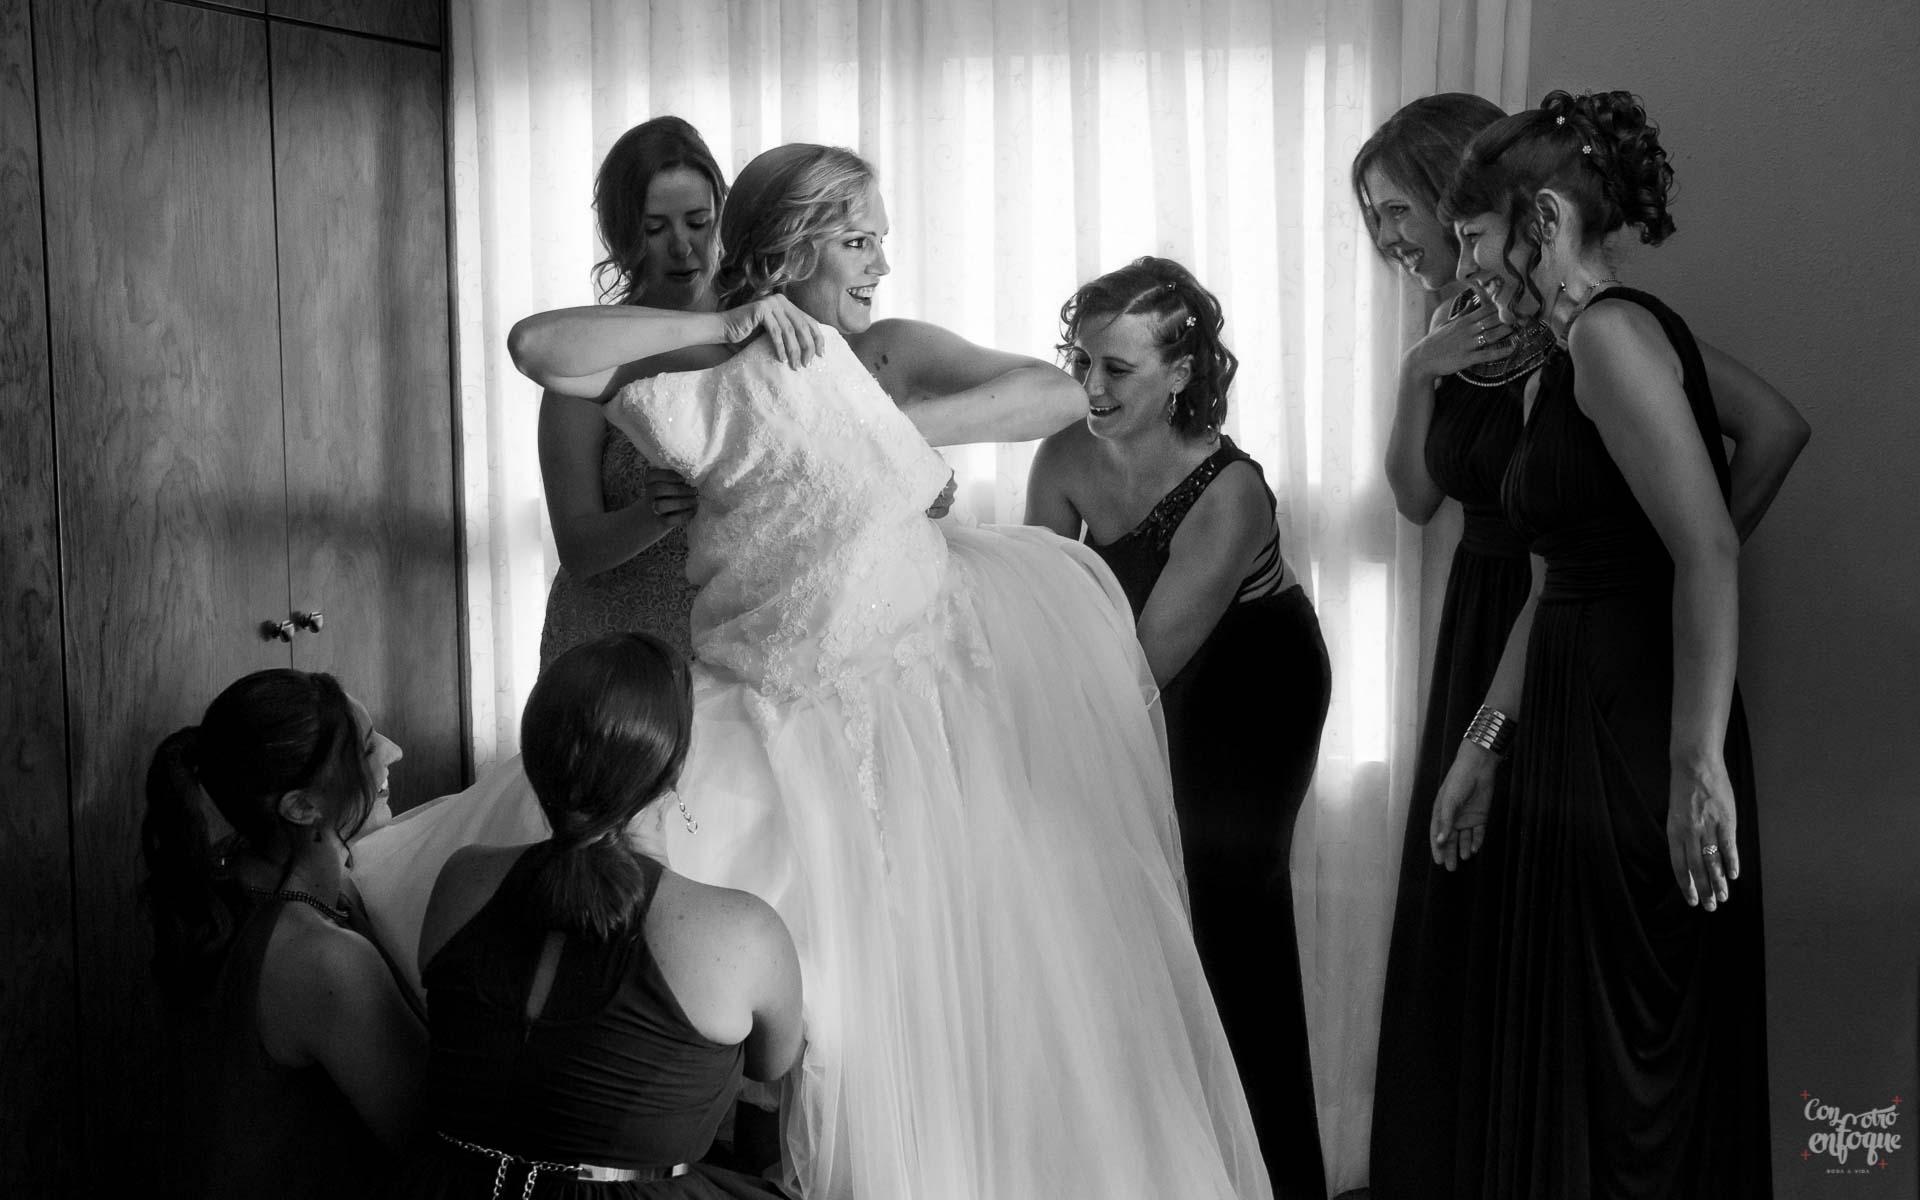 las amigas de la novia. vestido de novia. vestir a la novia. Fotógrafo de boda en Valencia